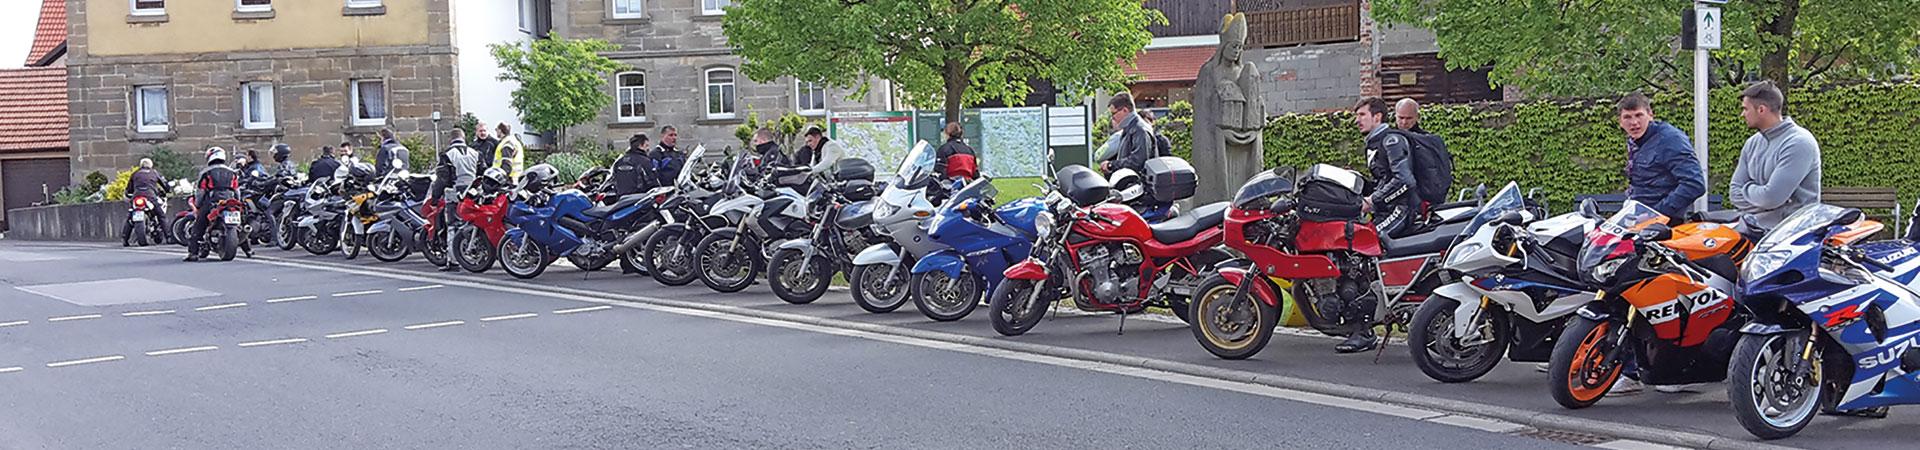 Motorrad-Gruppenreise-Pfarrweisach-Titel_02-06-2018_e05e4